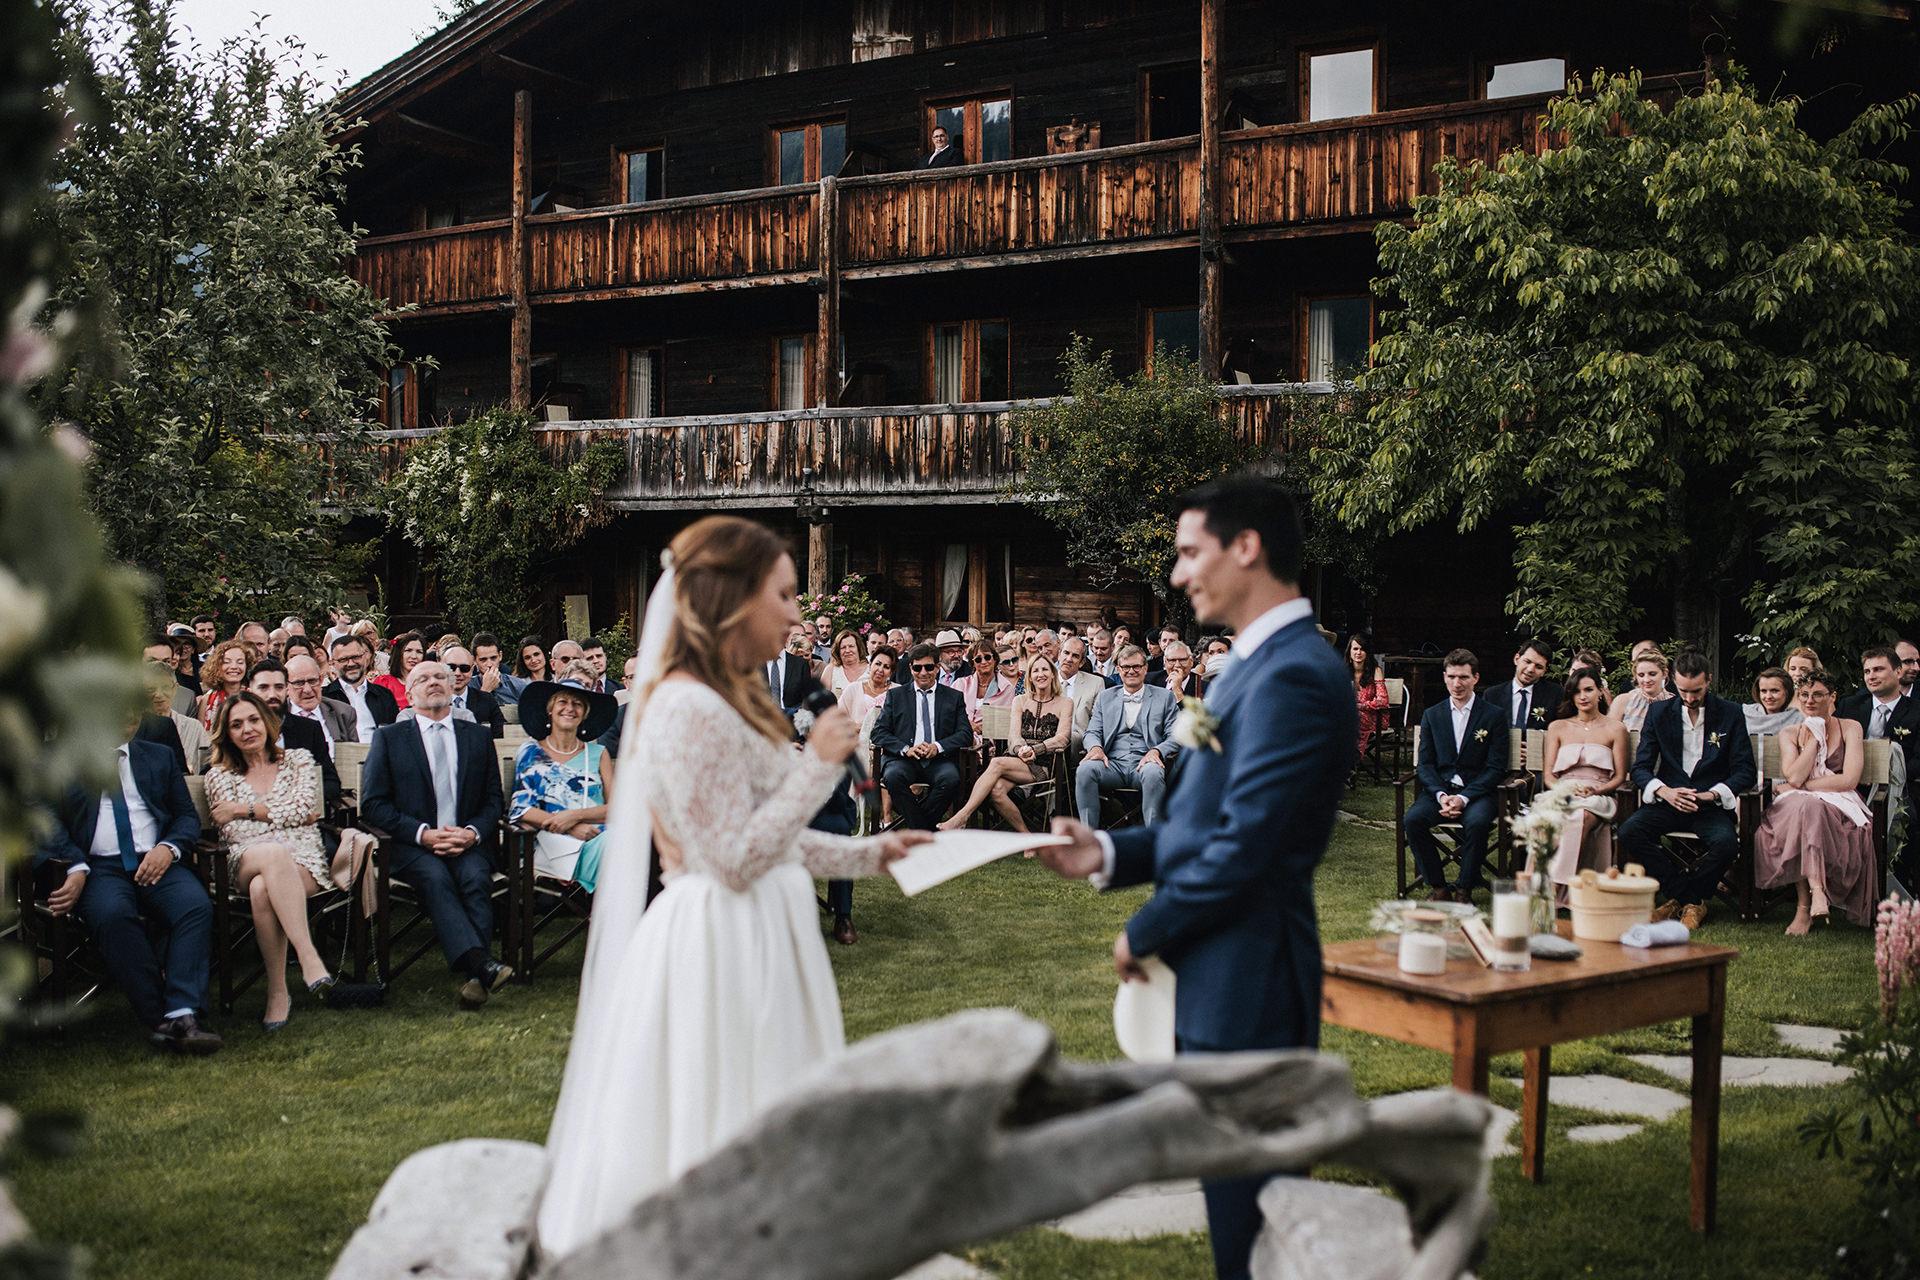 Wedding_megeve_fermes_de_marie_melanie+romain_neupapphotography-436.jpg